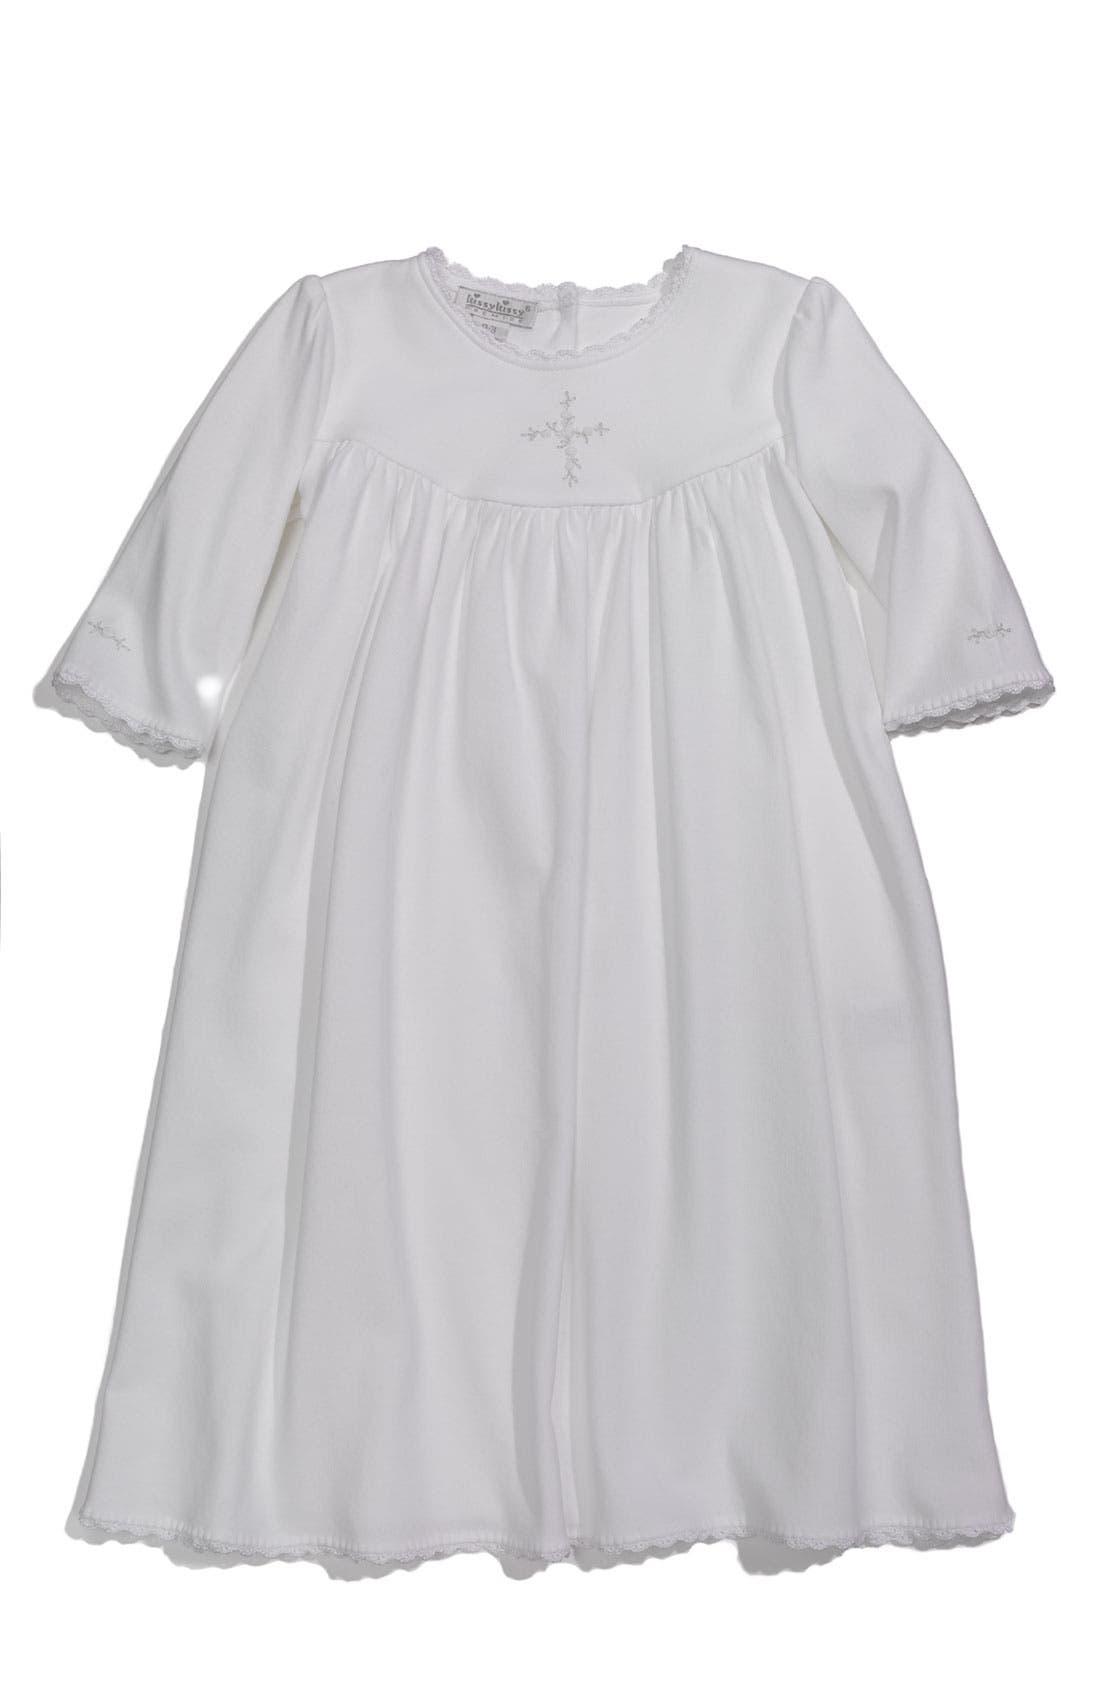 Alternate Image 1 Selected - Kissy Kissy 'Hope's Cross' Gown (Infant)